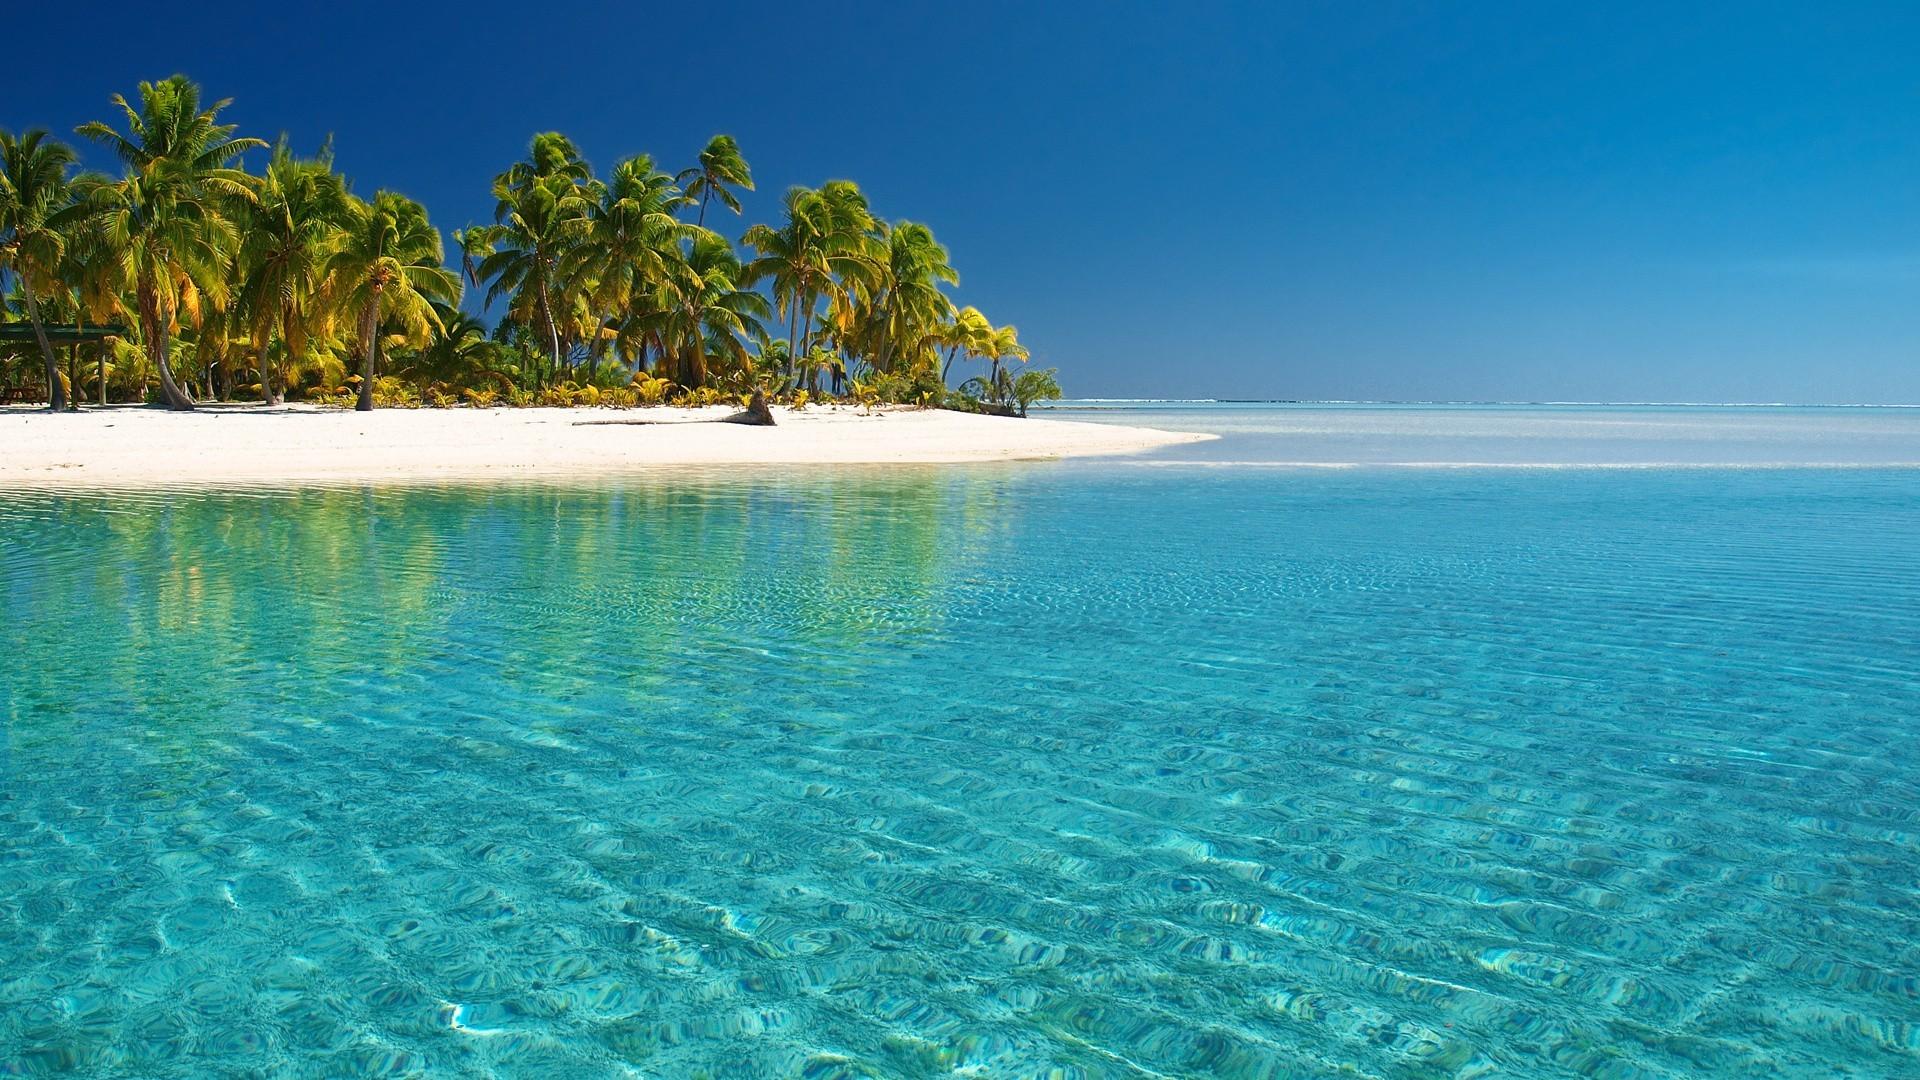 … wallpaper background wallpapersafari; free summer picture full hd  desktop images amazing free hi res …